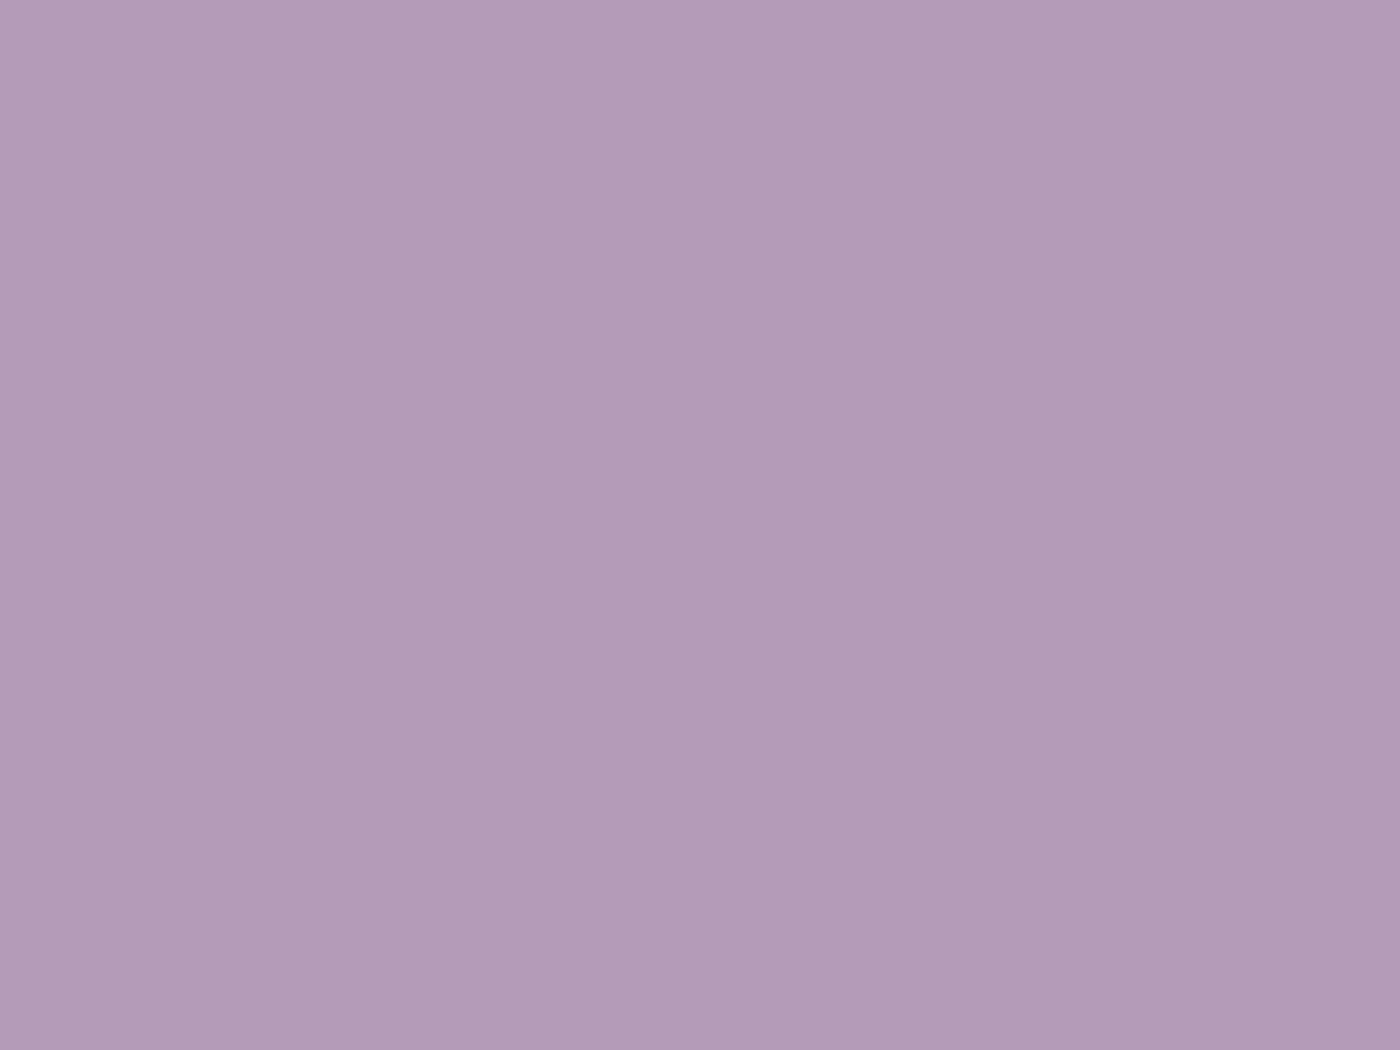 1400x1050 Pastel Purple Solid Color Background